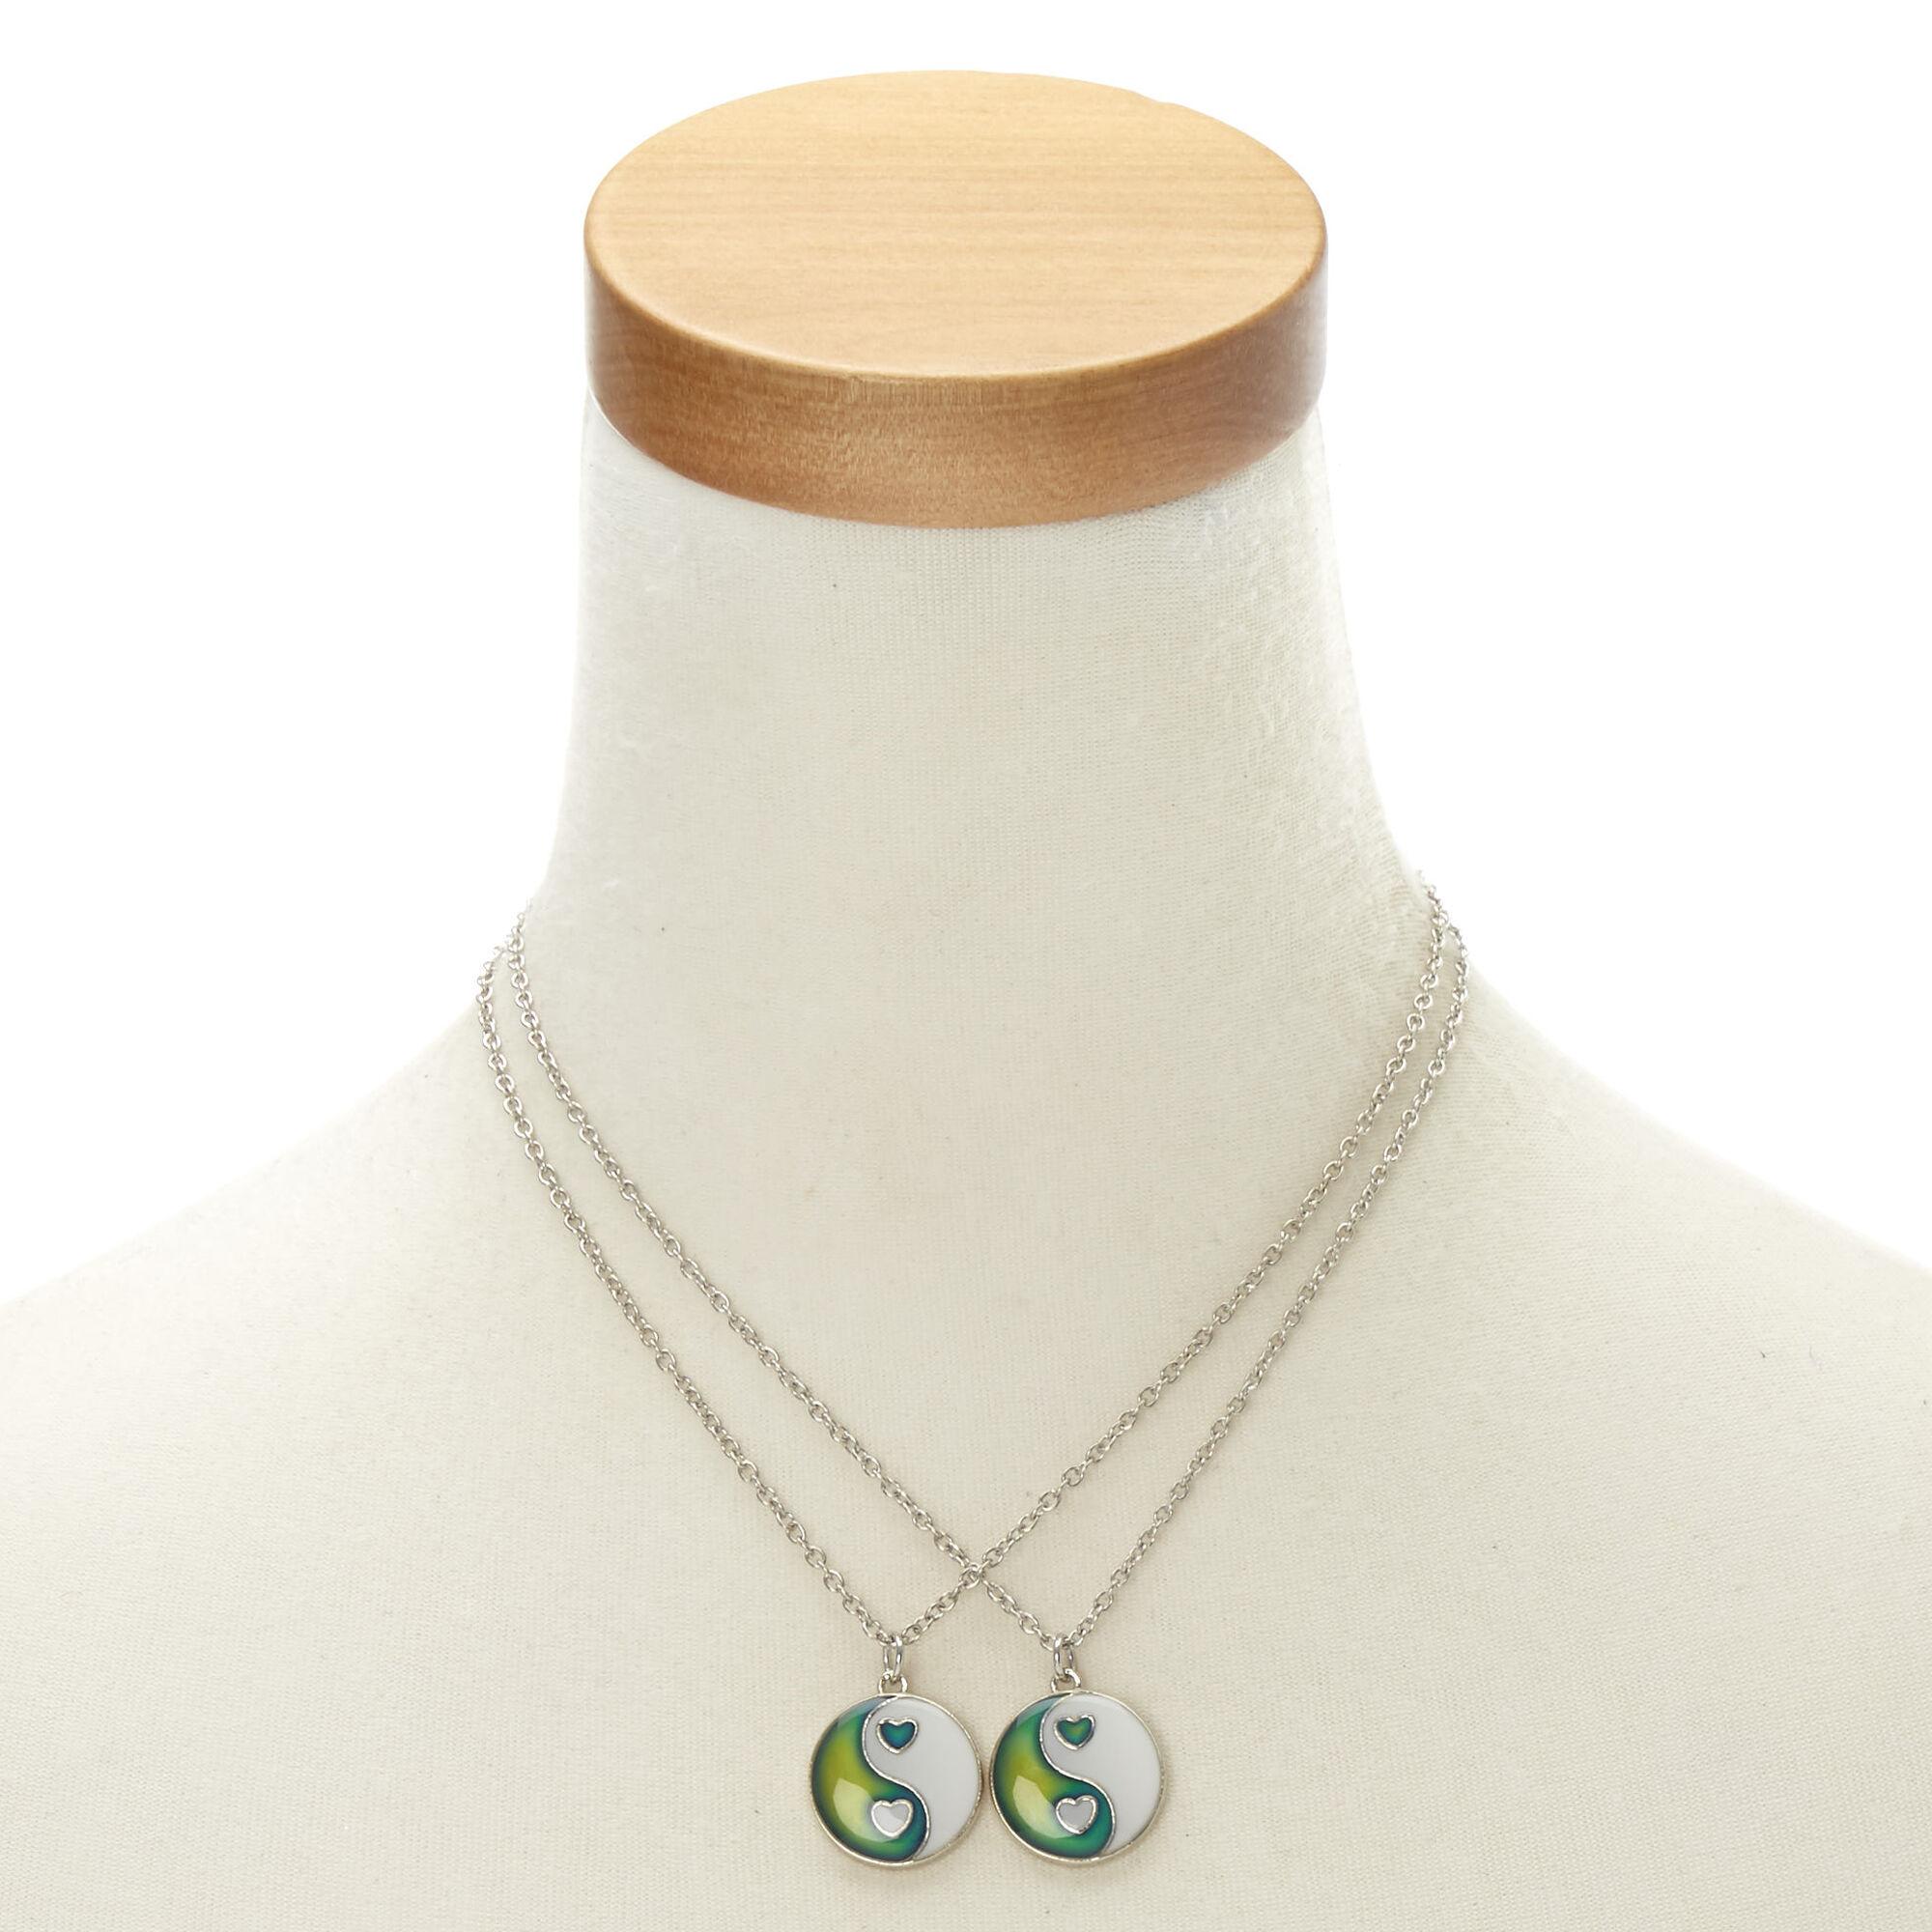 Set The Mood For Everything: Yin Yang Mood Necklace Set